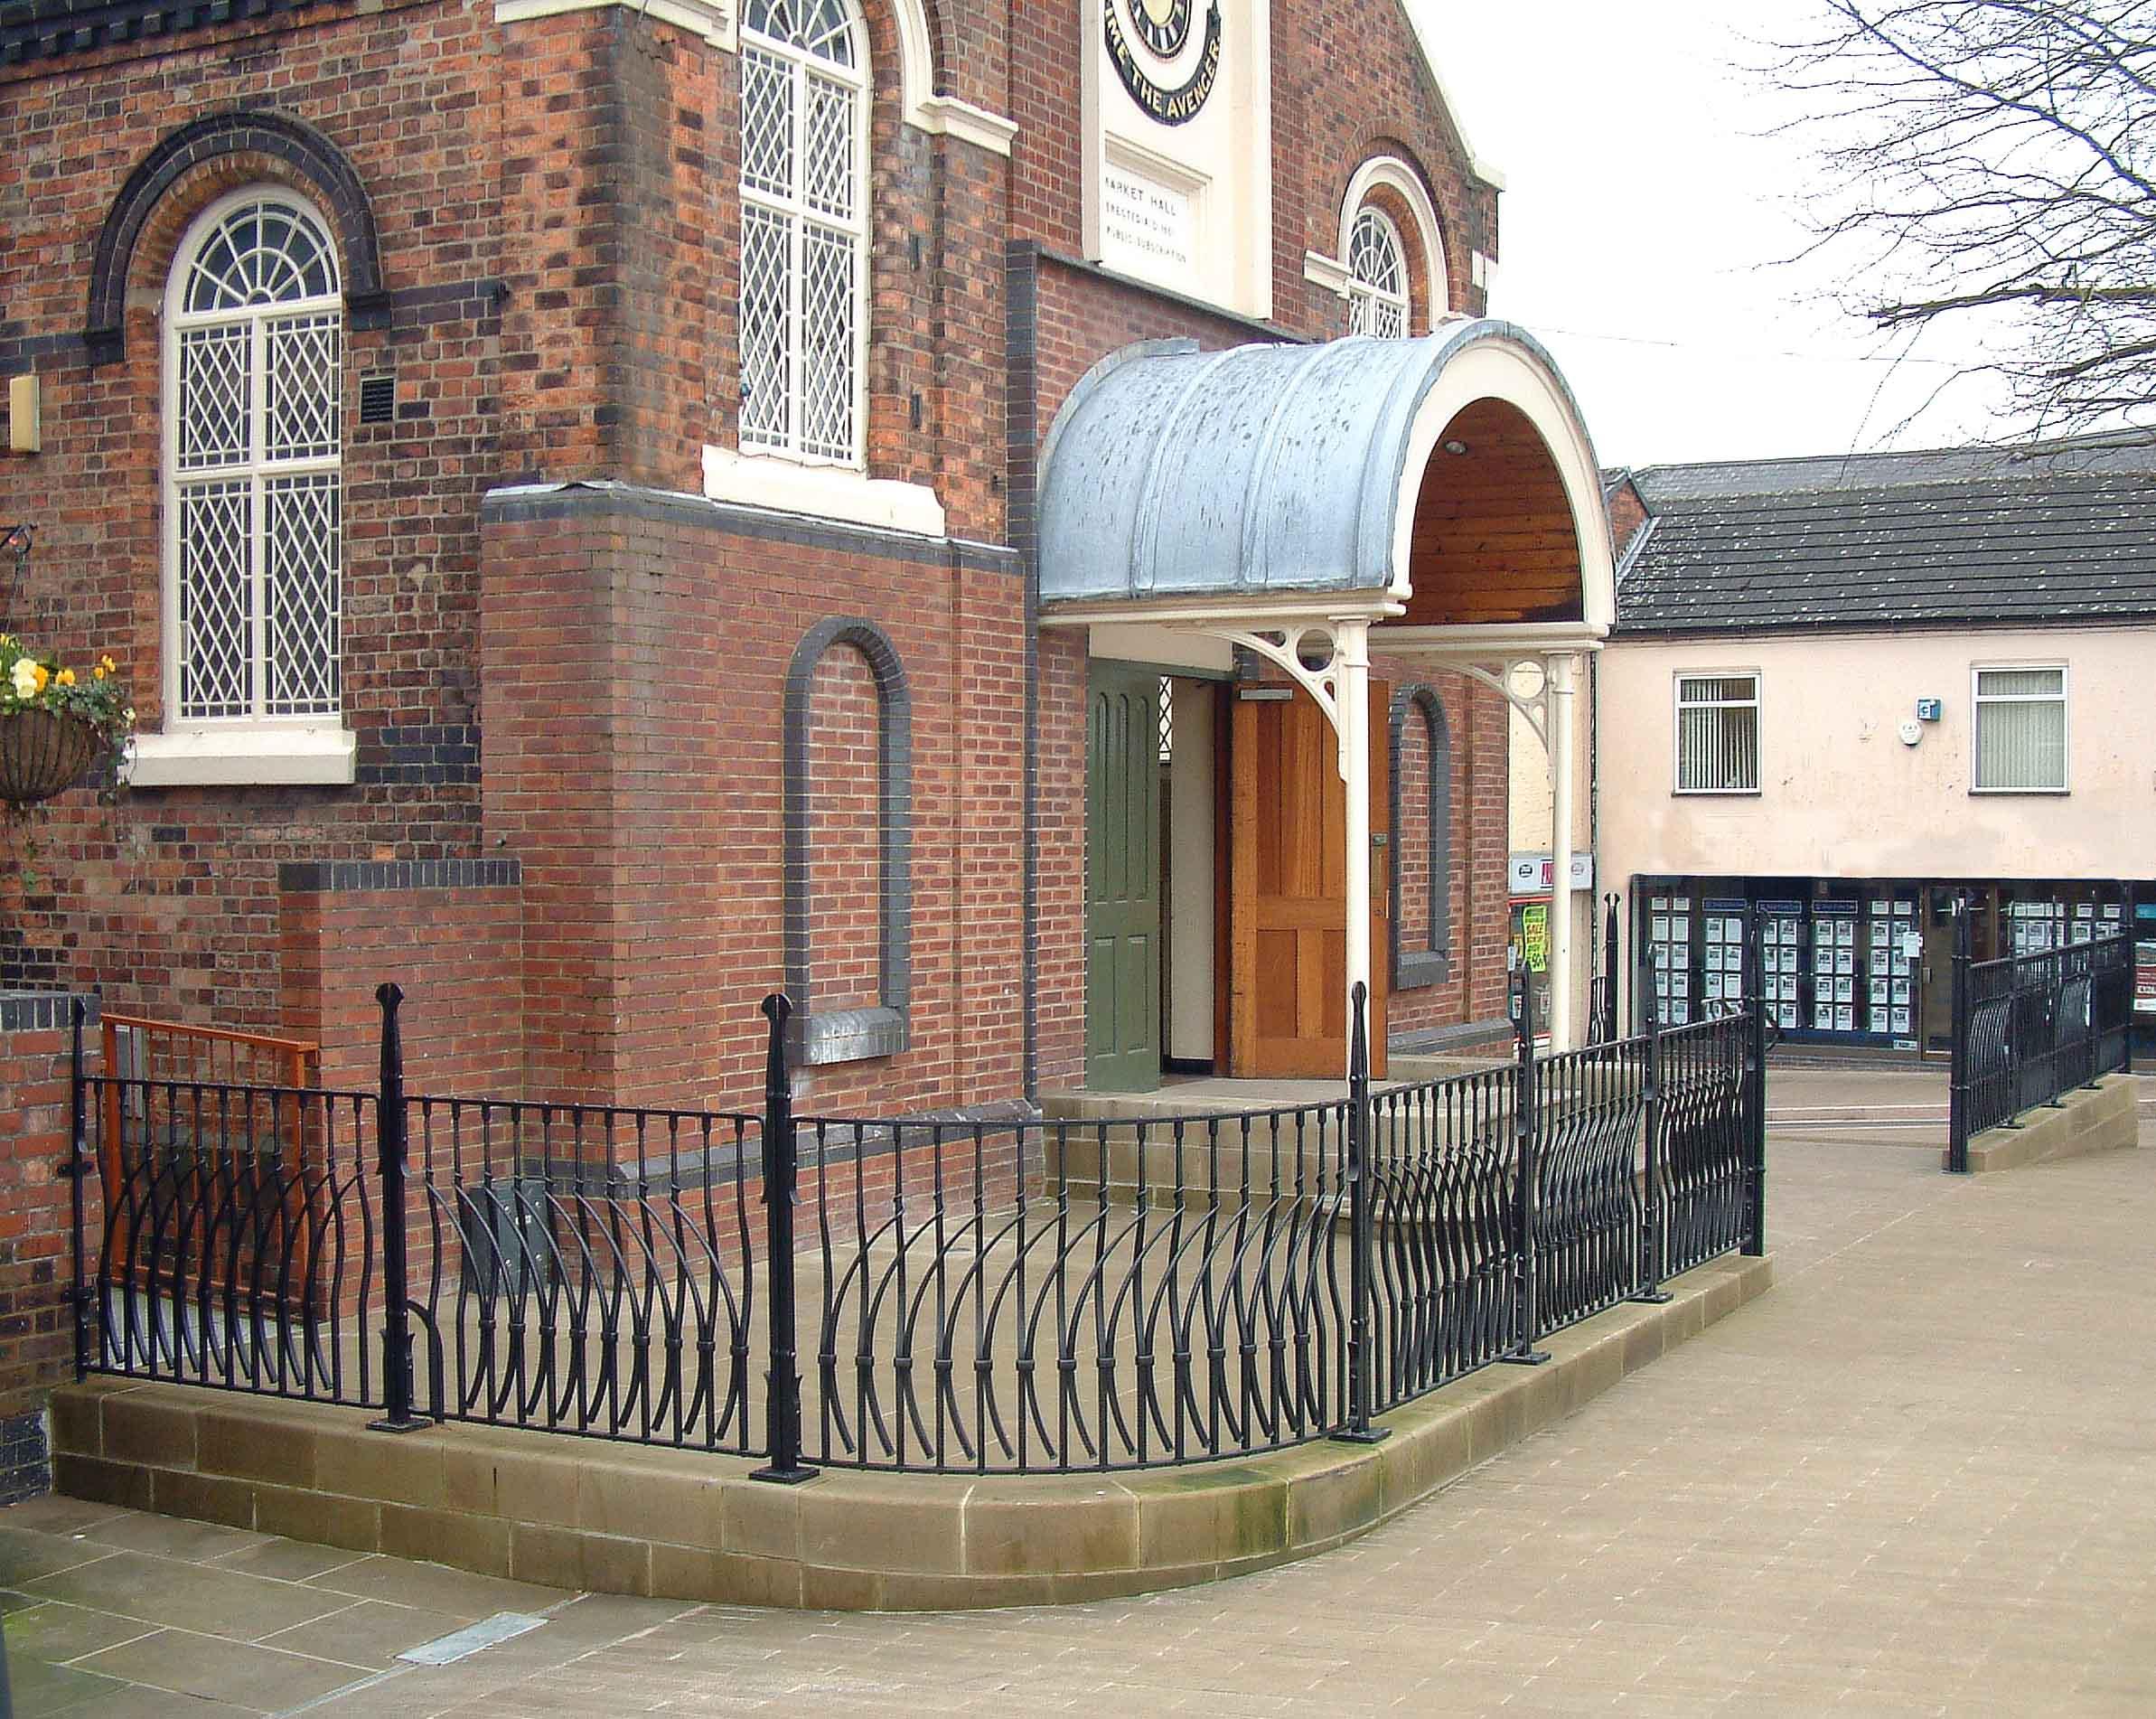 Swadlincote Town Hall rlgs